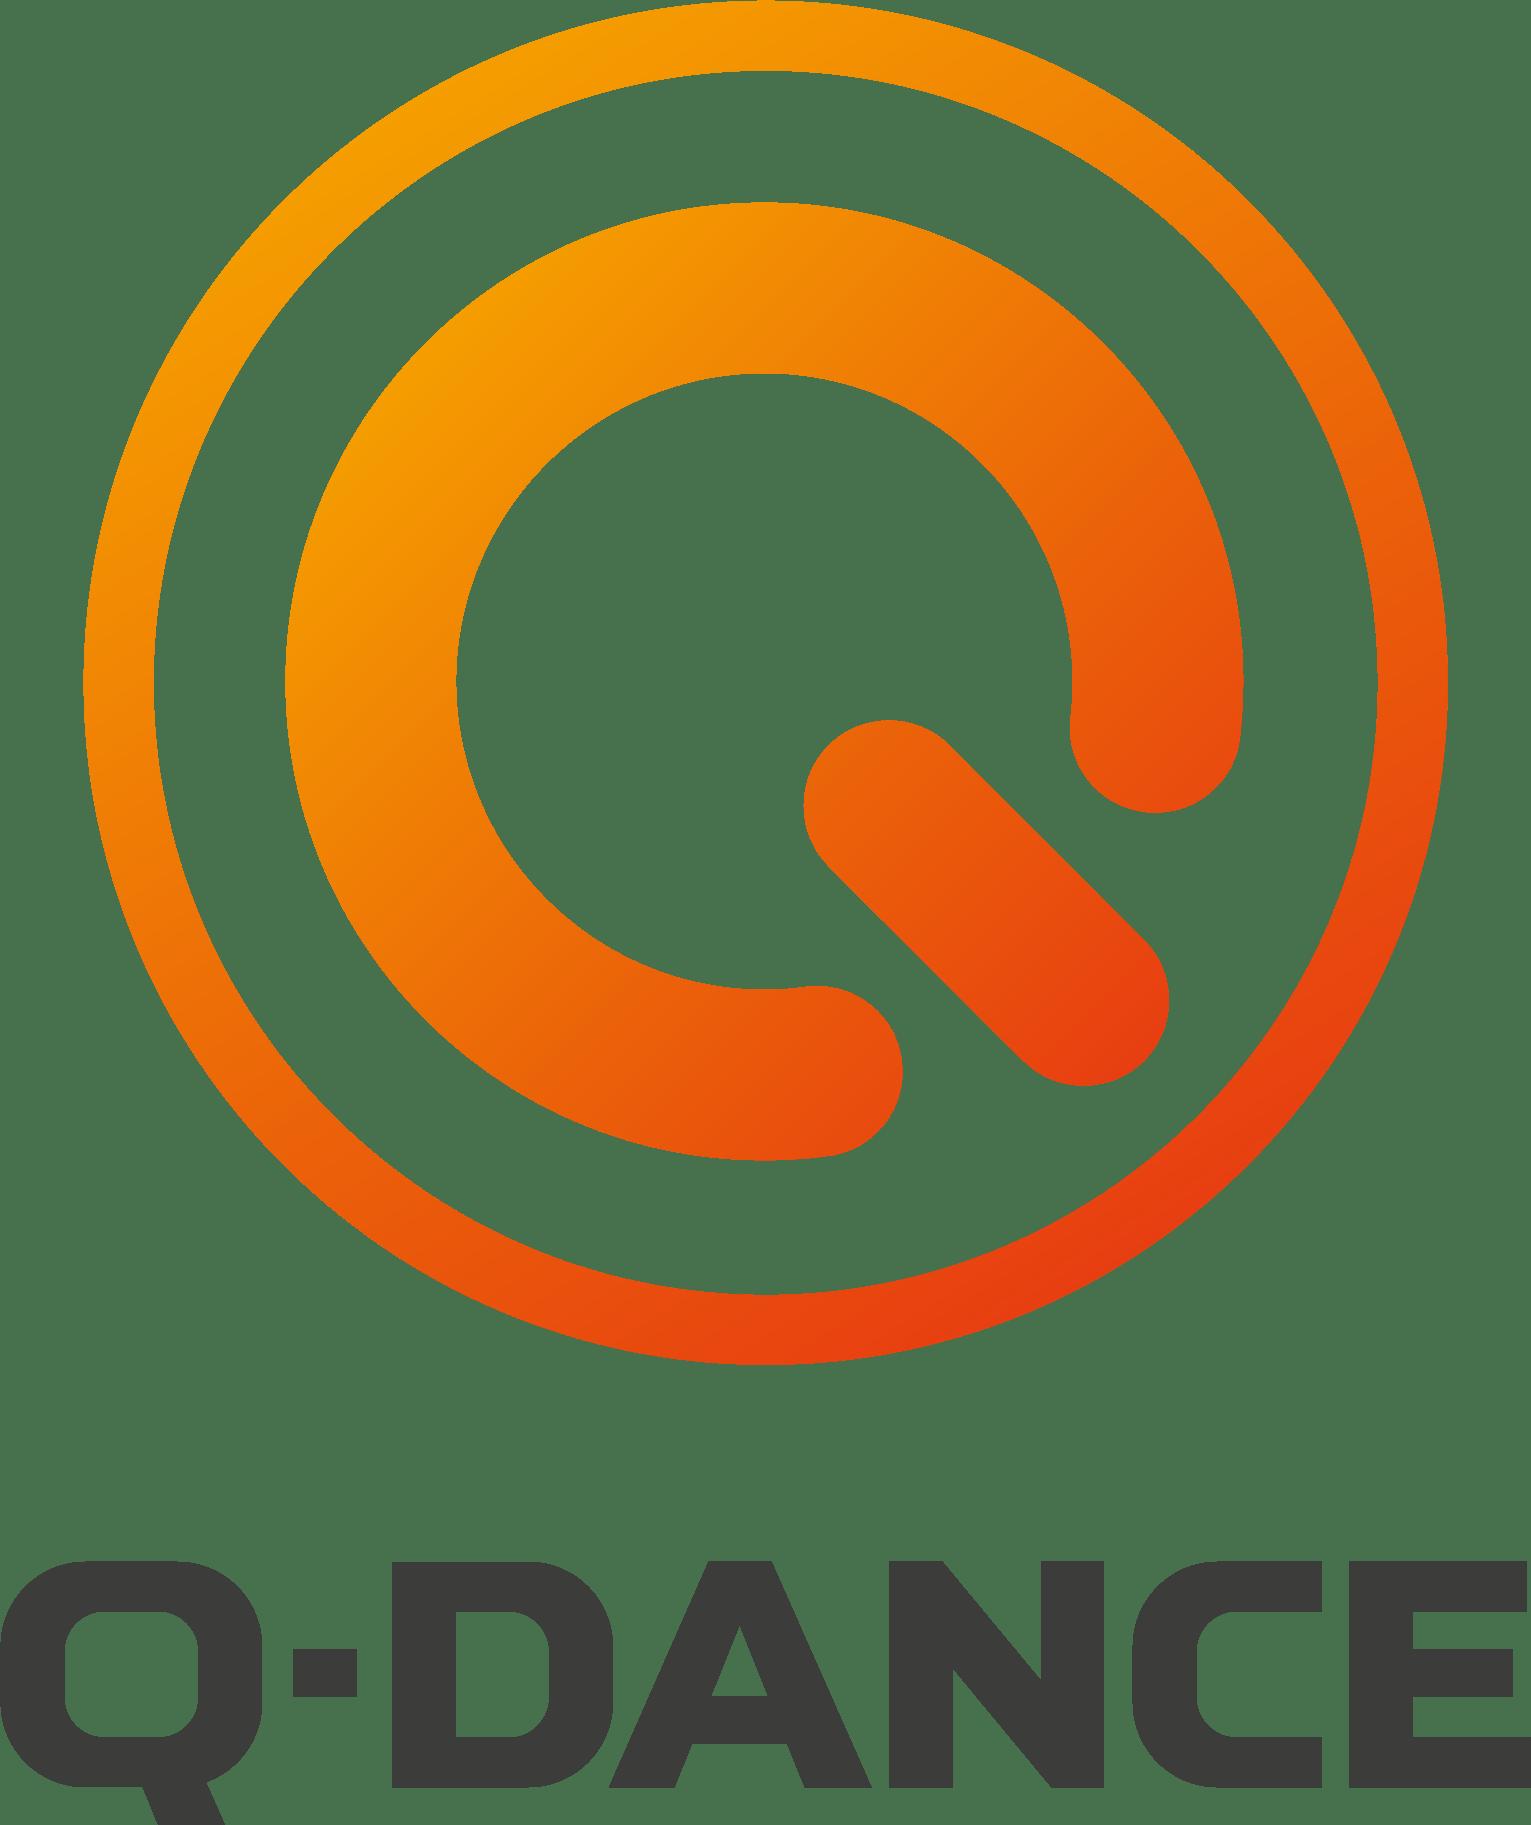 Q-dance logo